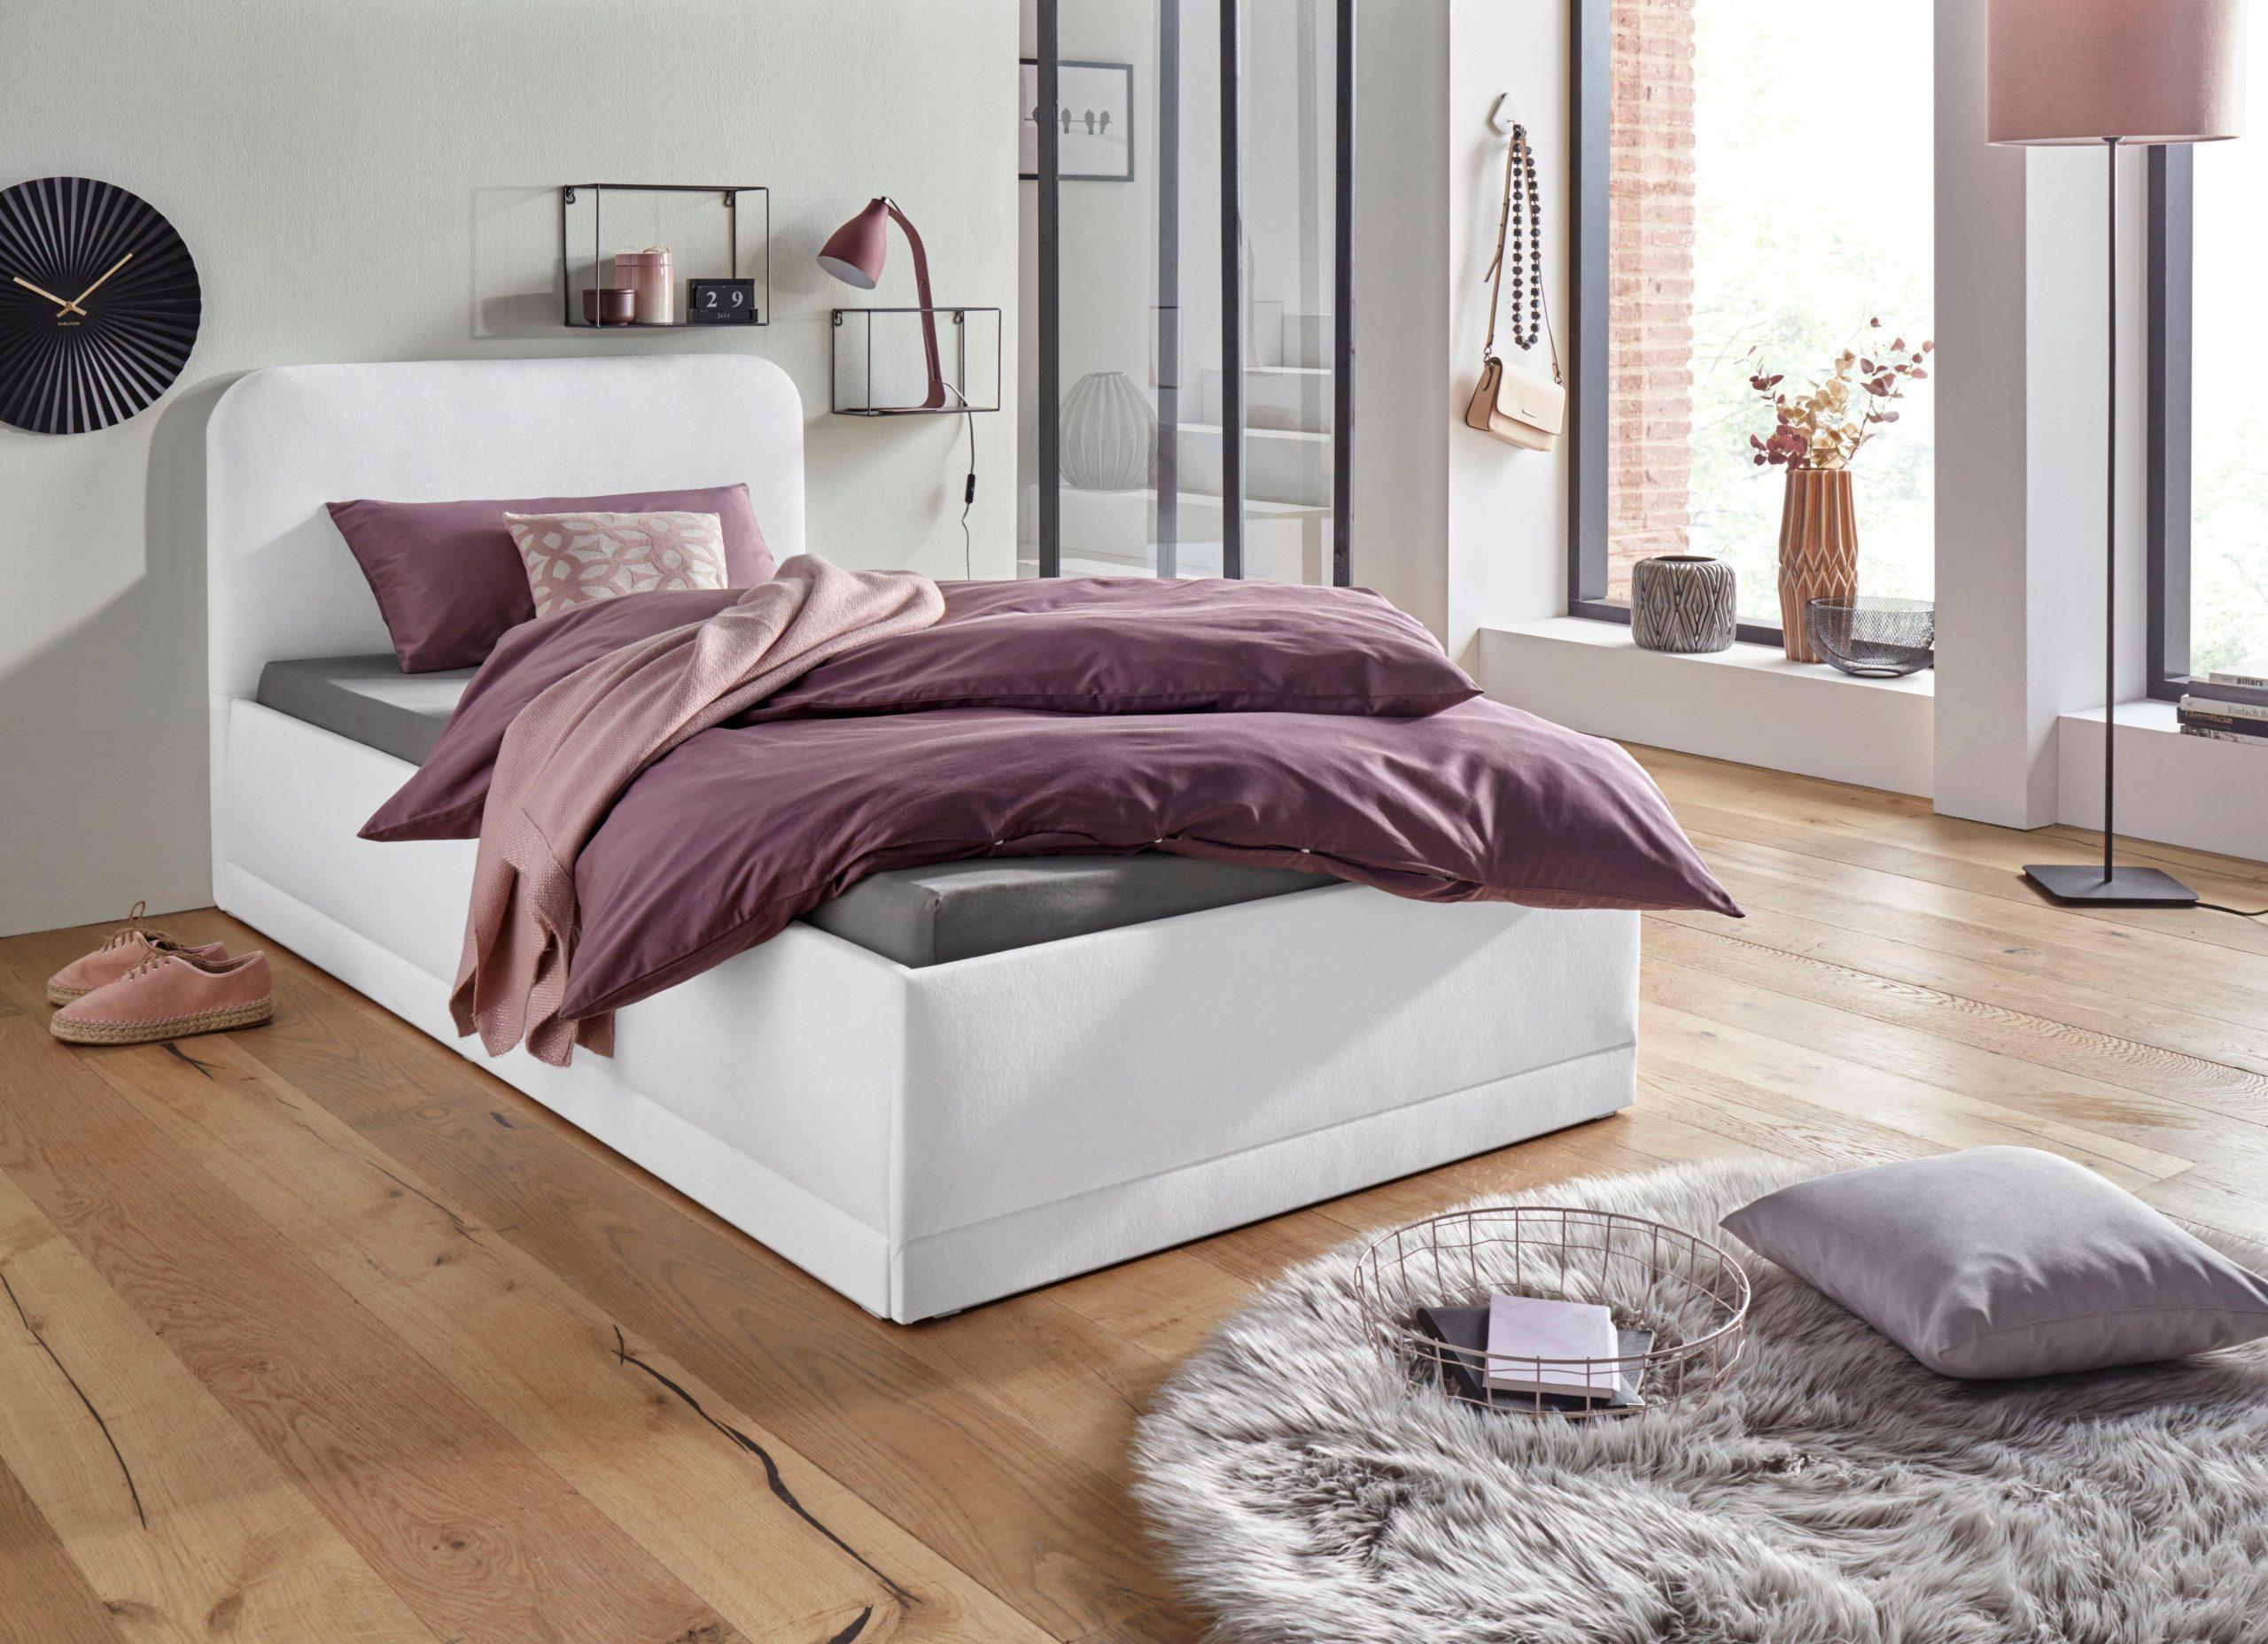 Full Size of Luxus Bett Betten 90x200 Sofa Mit Bettkasten 80x200 Schlafzimmer Set Boxspringbett Moebel De Rückenlehne Minion Eiche Massiv 180x200 160 Bonprix Japanische Bett Luxus Bett